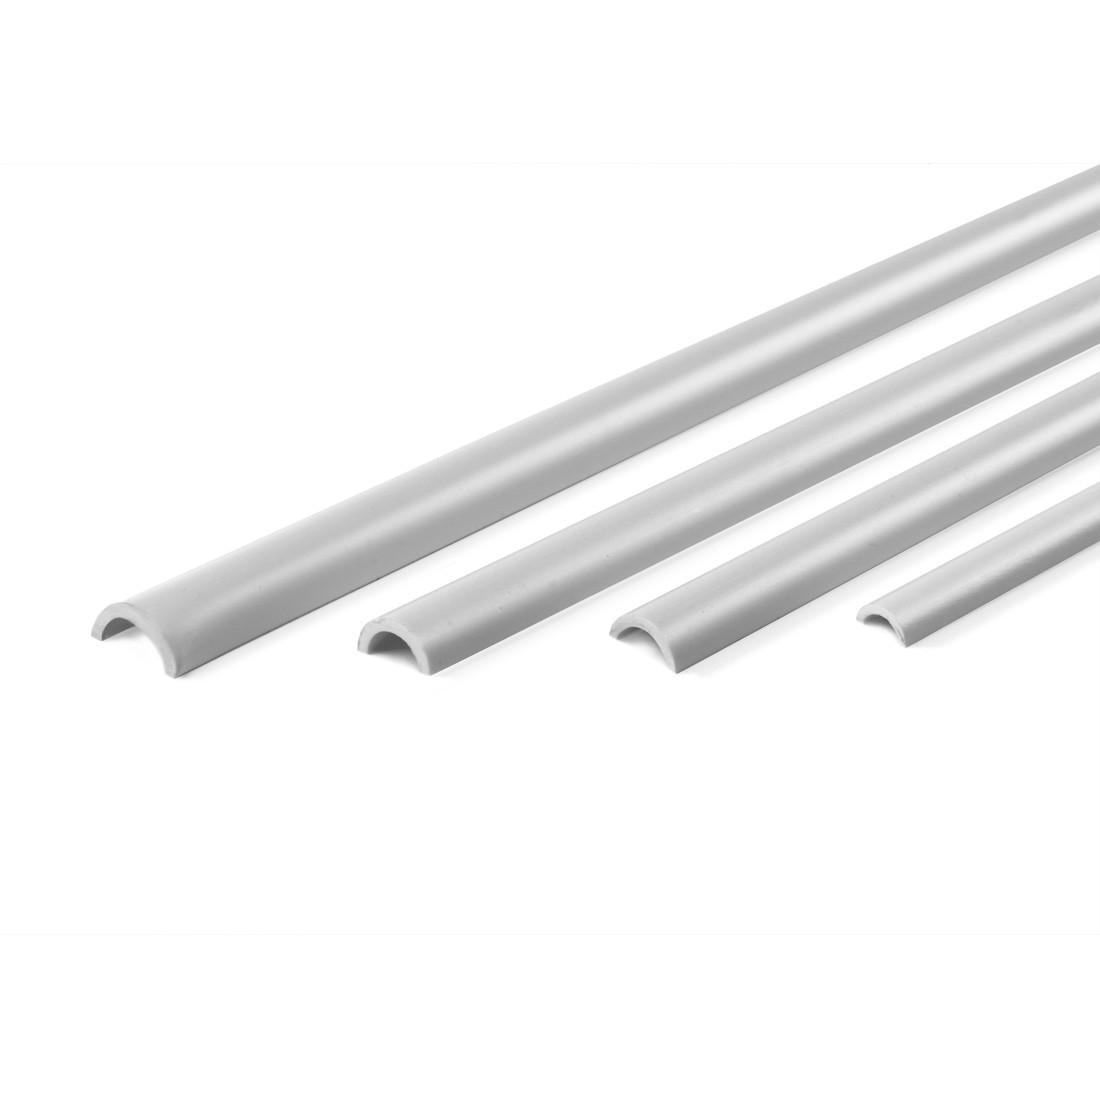 Profile ASA démi tube mm.4,5x6x1000